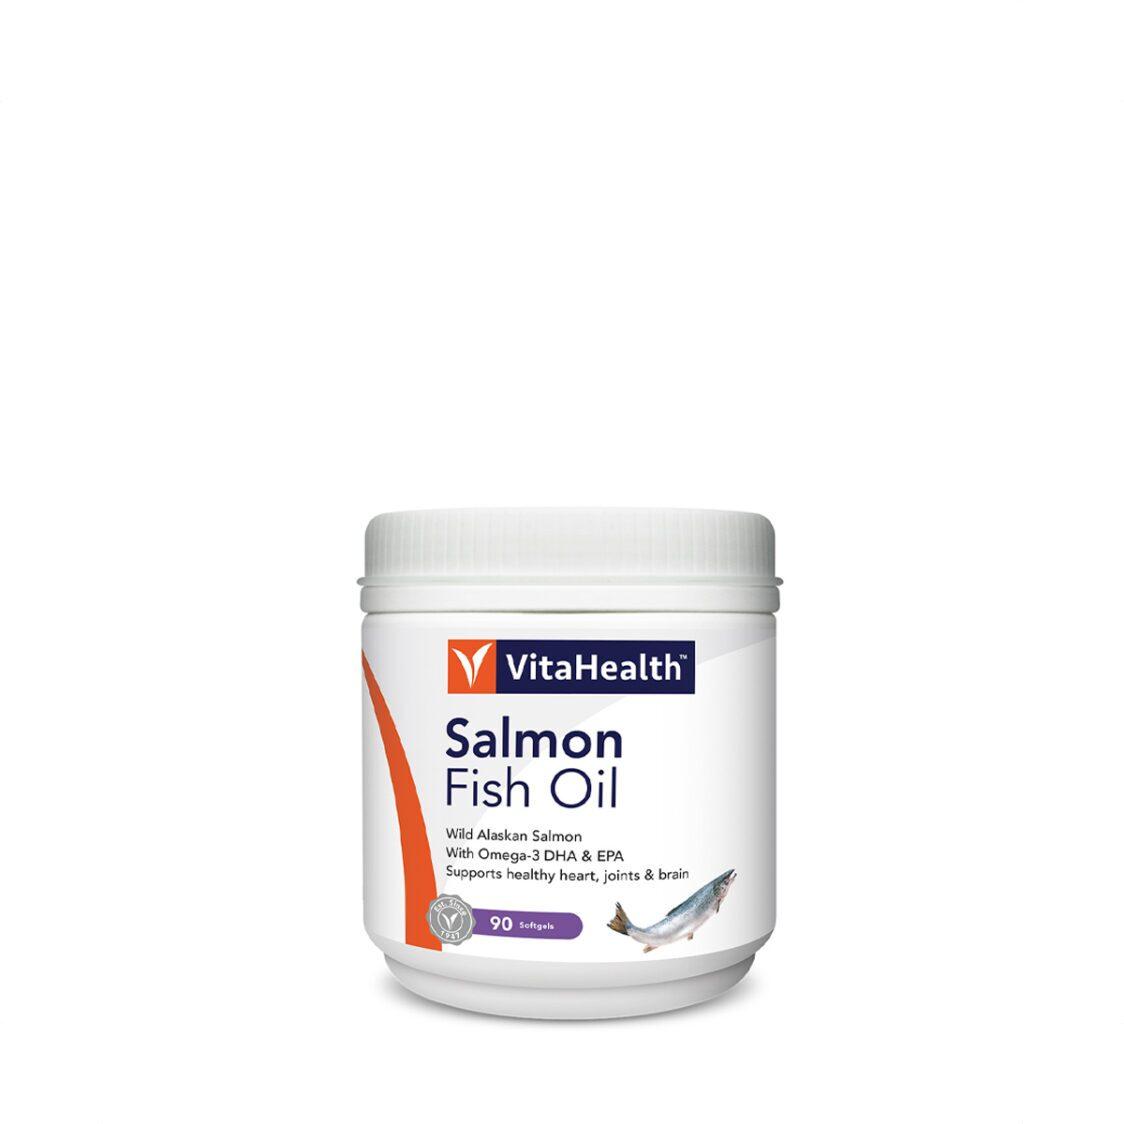 VitaHealth Salmon Fish Oil 90 Softgels